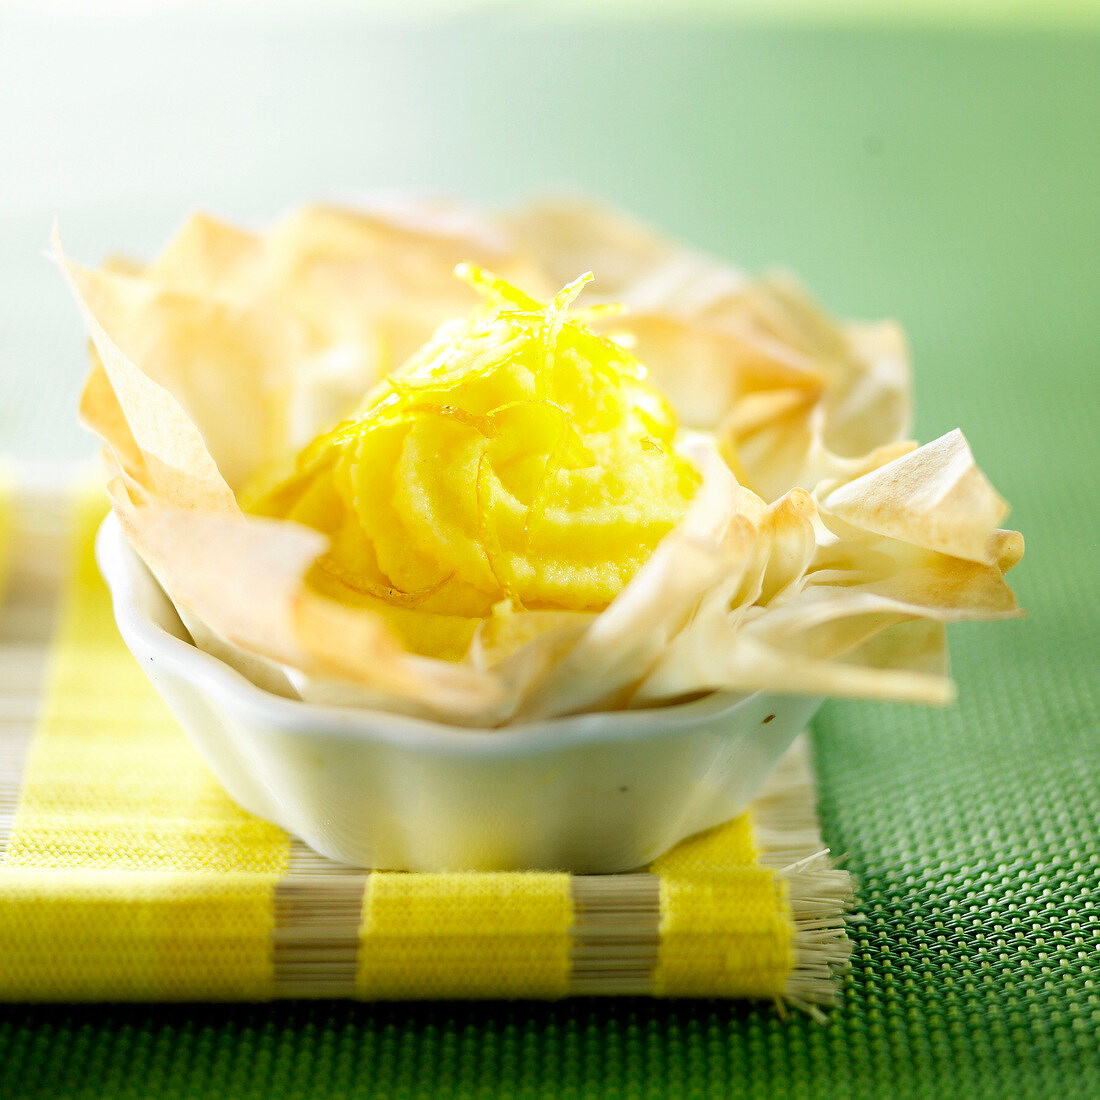 Lemon mousse in a crisy filo pastry tulip